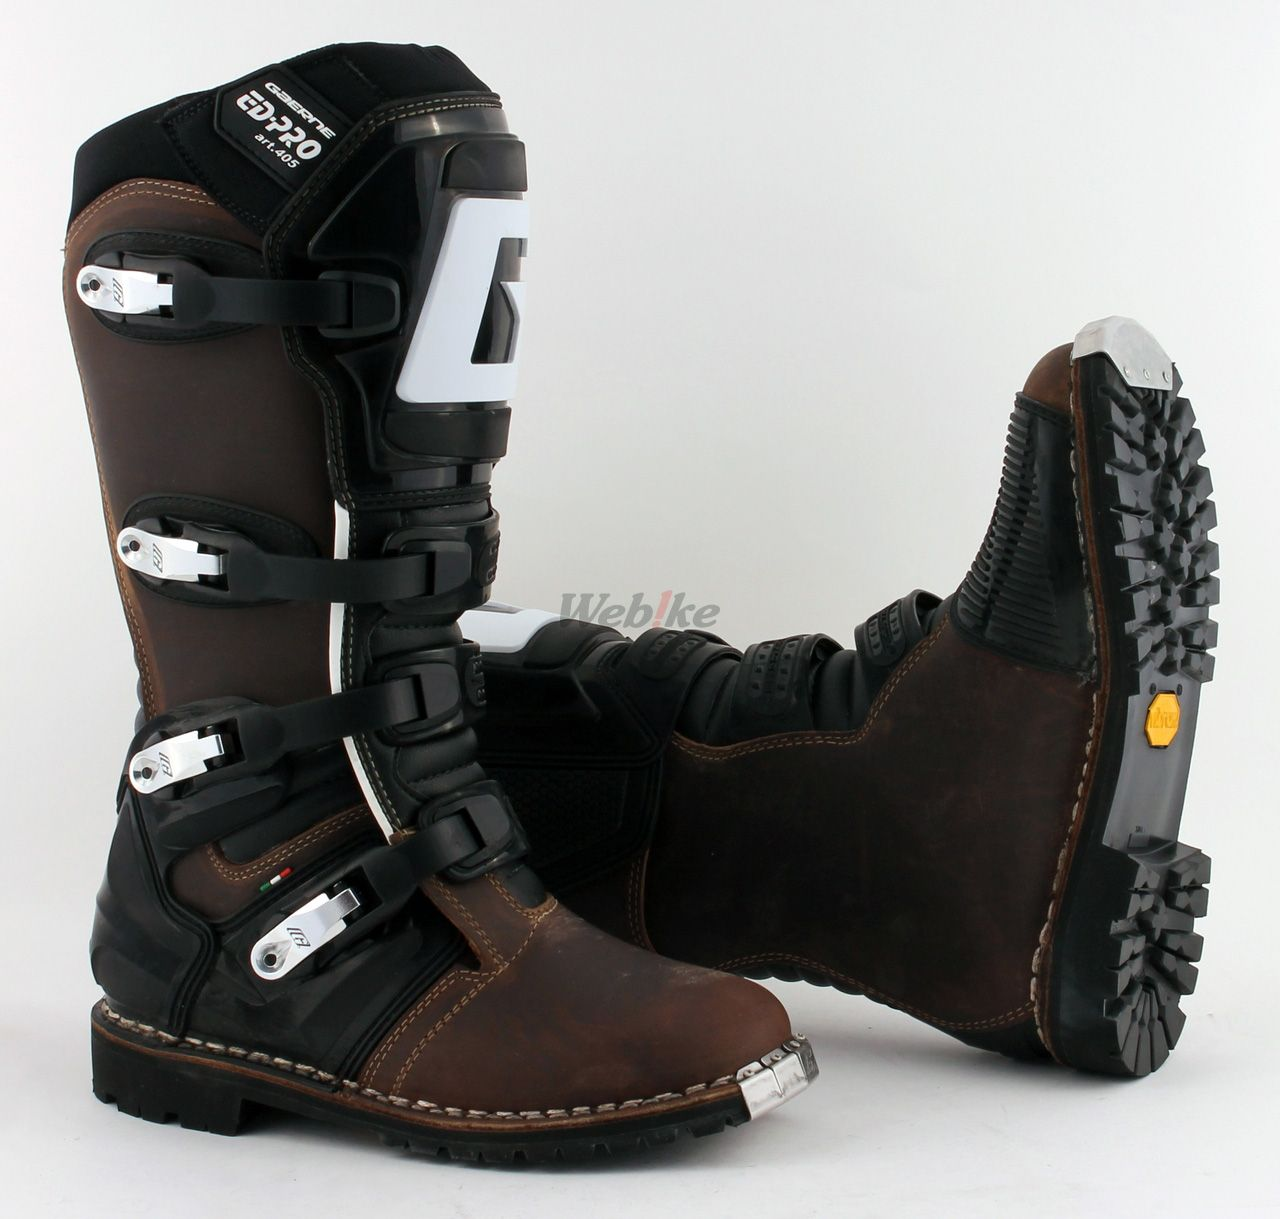 ED-PRO ART.405 Enduro/Touring Boots